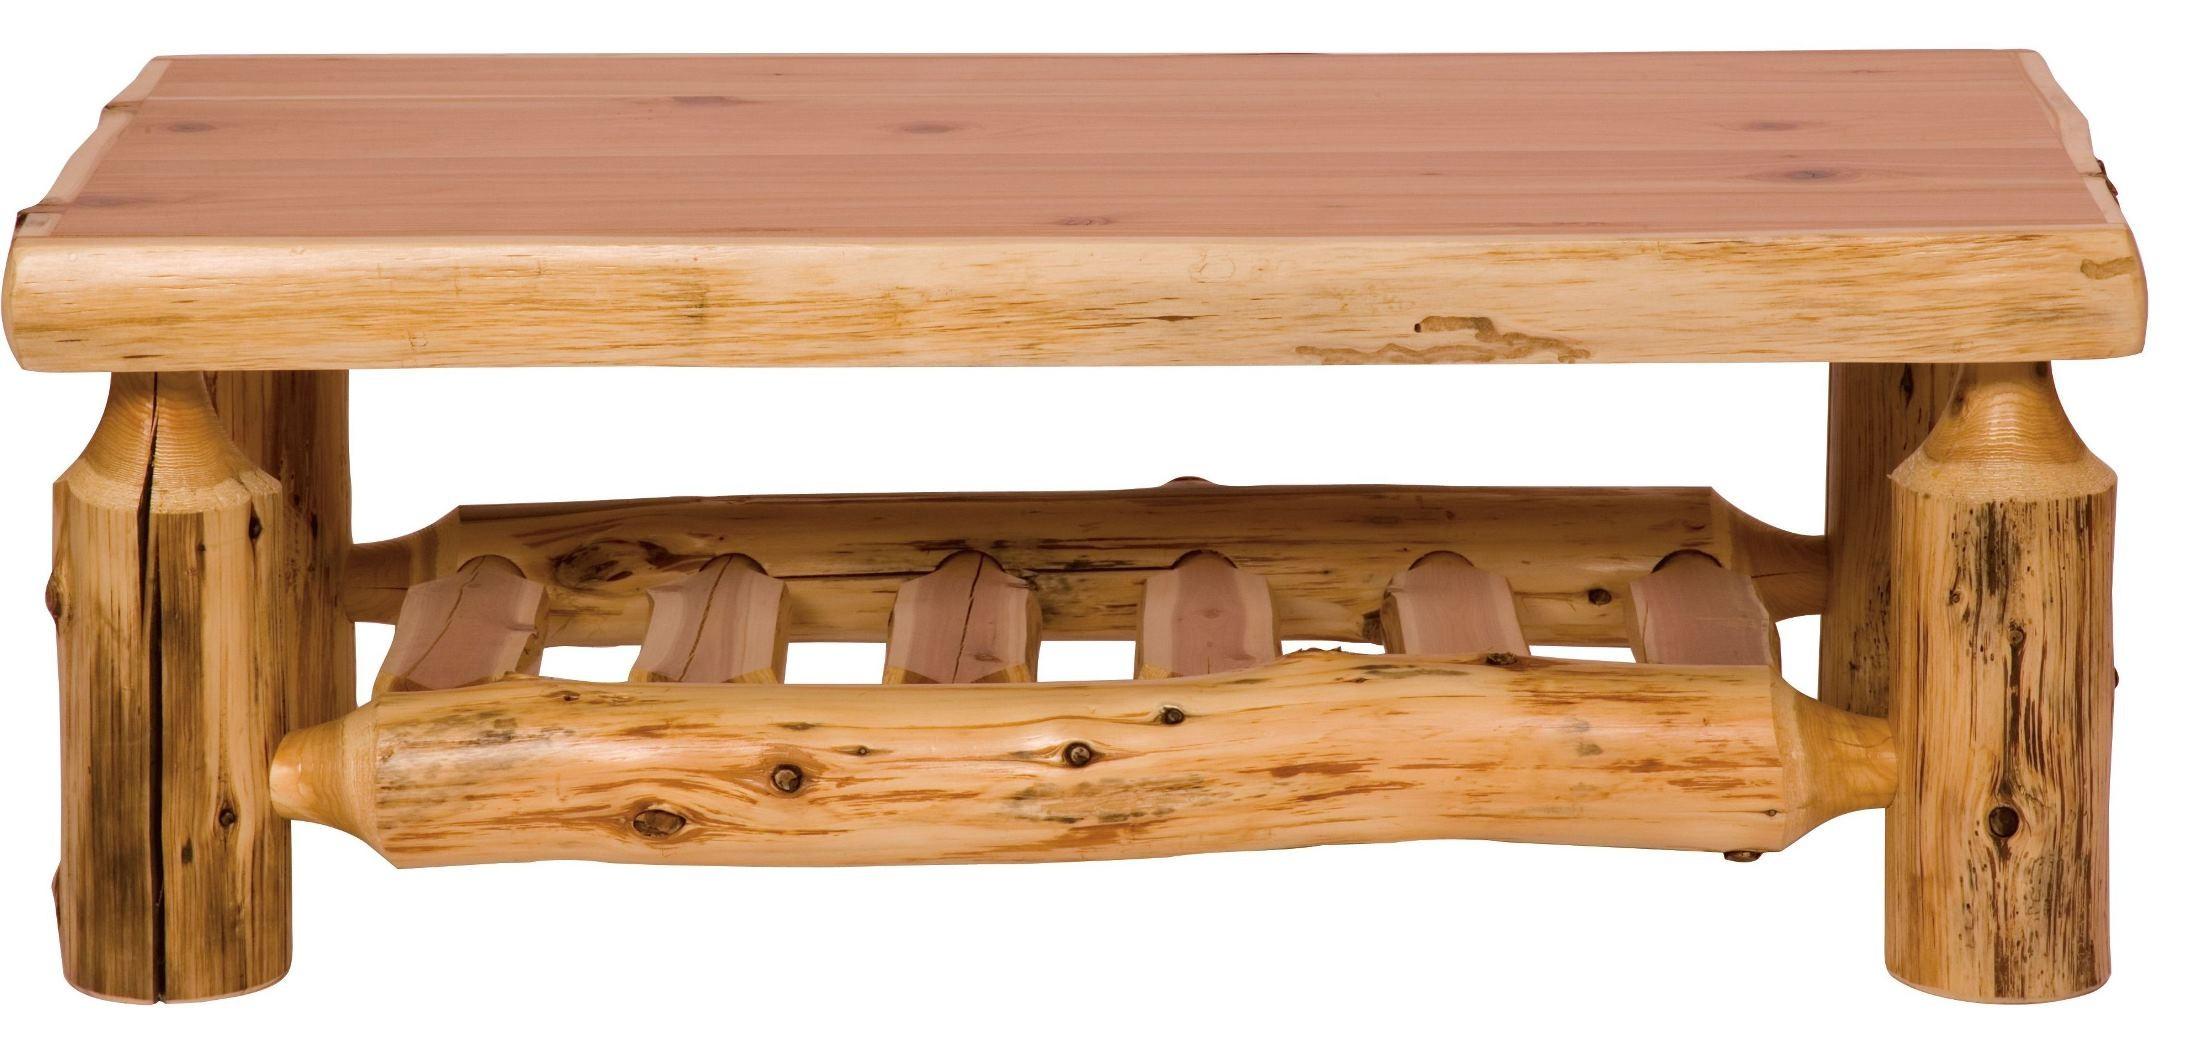 Cedar Open Standard Coffee Table From Fireside Lodge 14090 Coleman Furniture